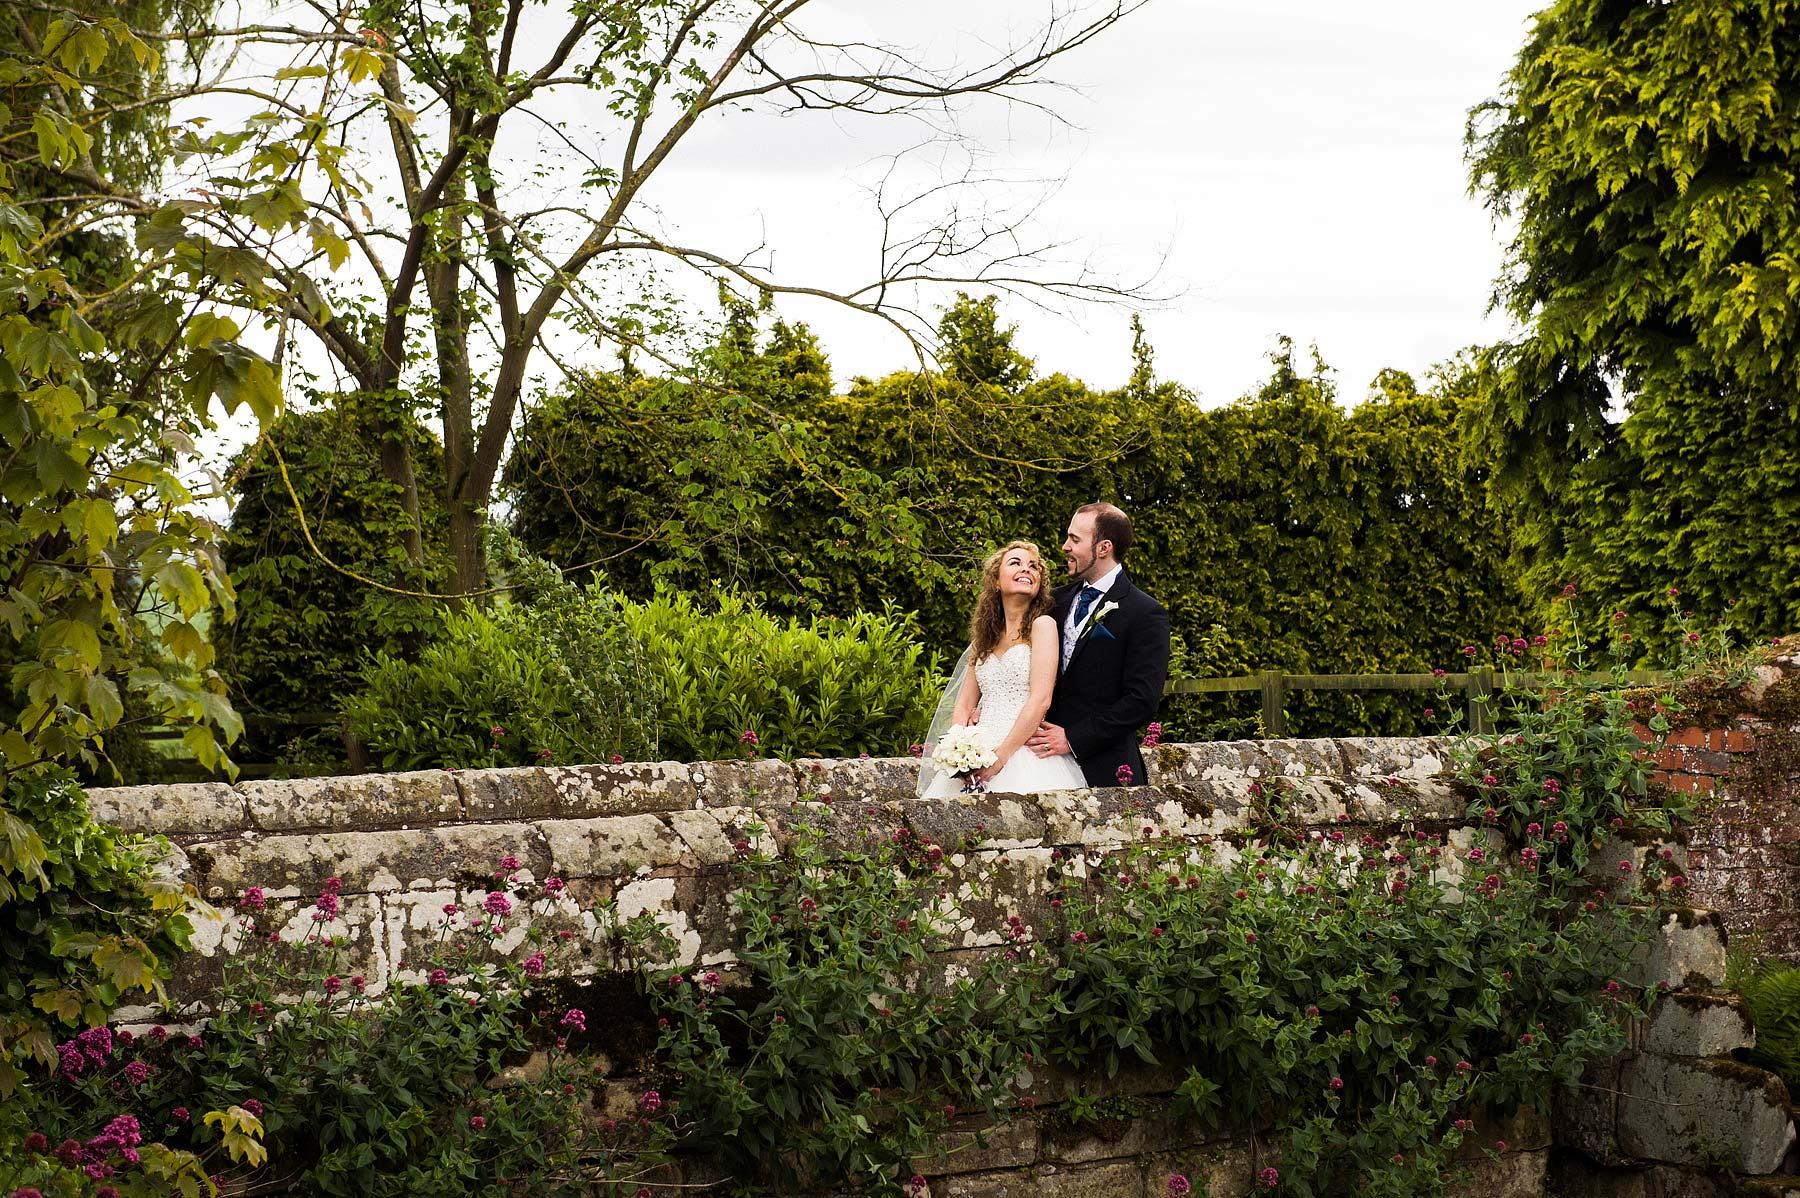 albright-hussey-manor-wedding-photographers-044